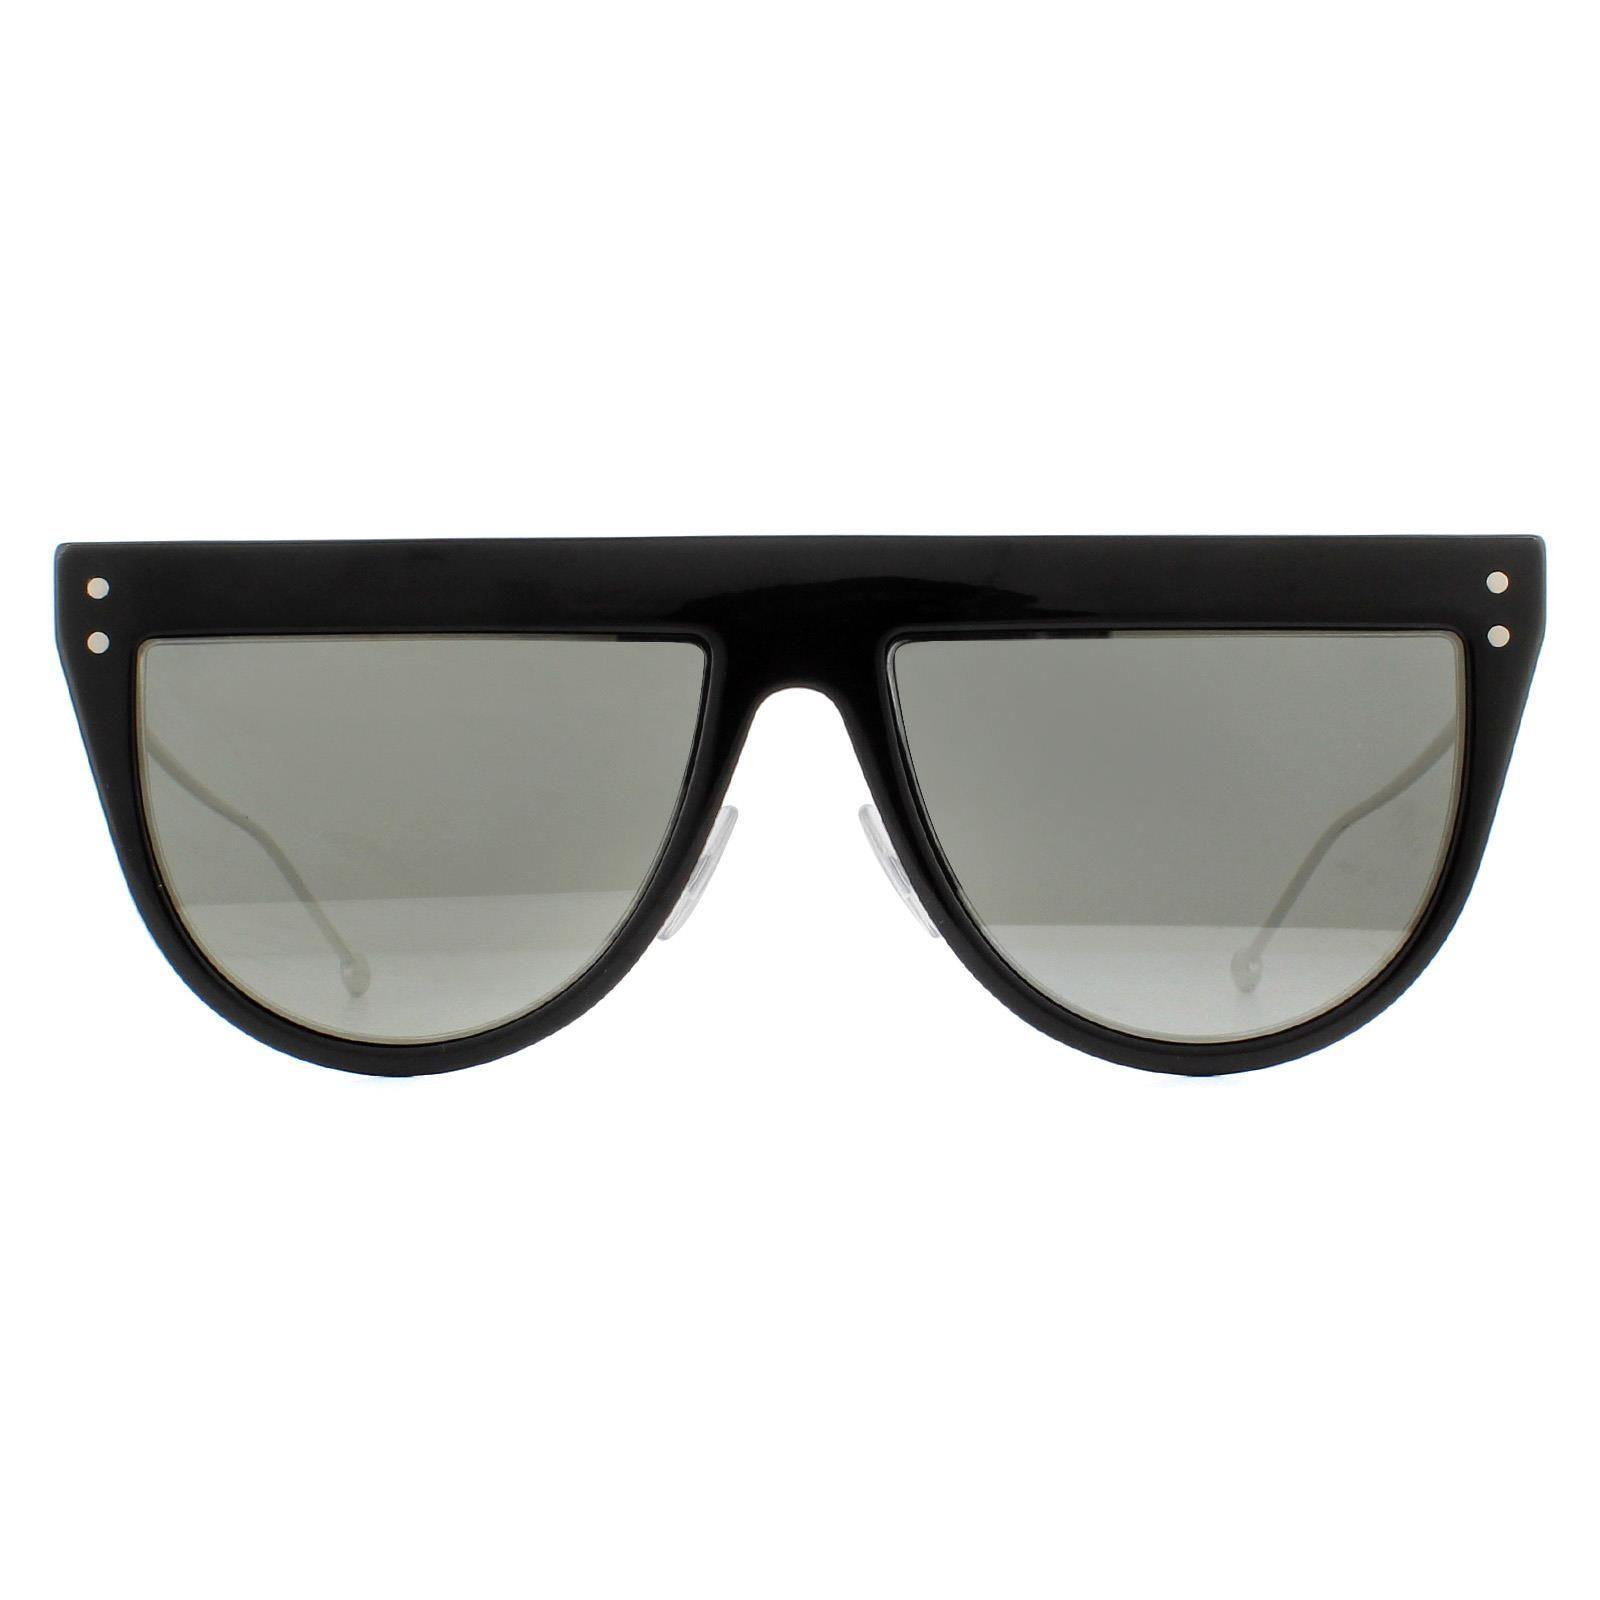 Fendi Sunglasses FF 0372/S 807 T4 Black and Silver Grey with Silver Mirror